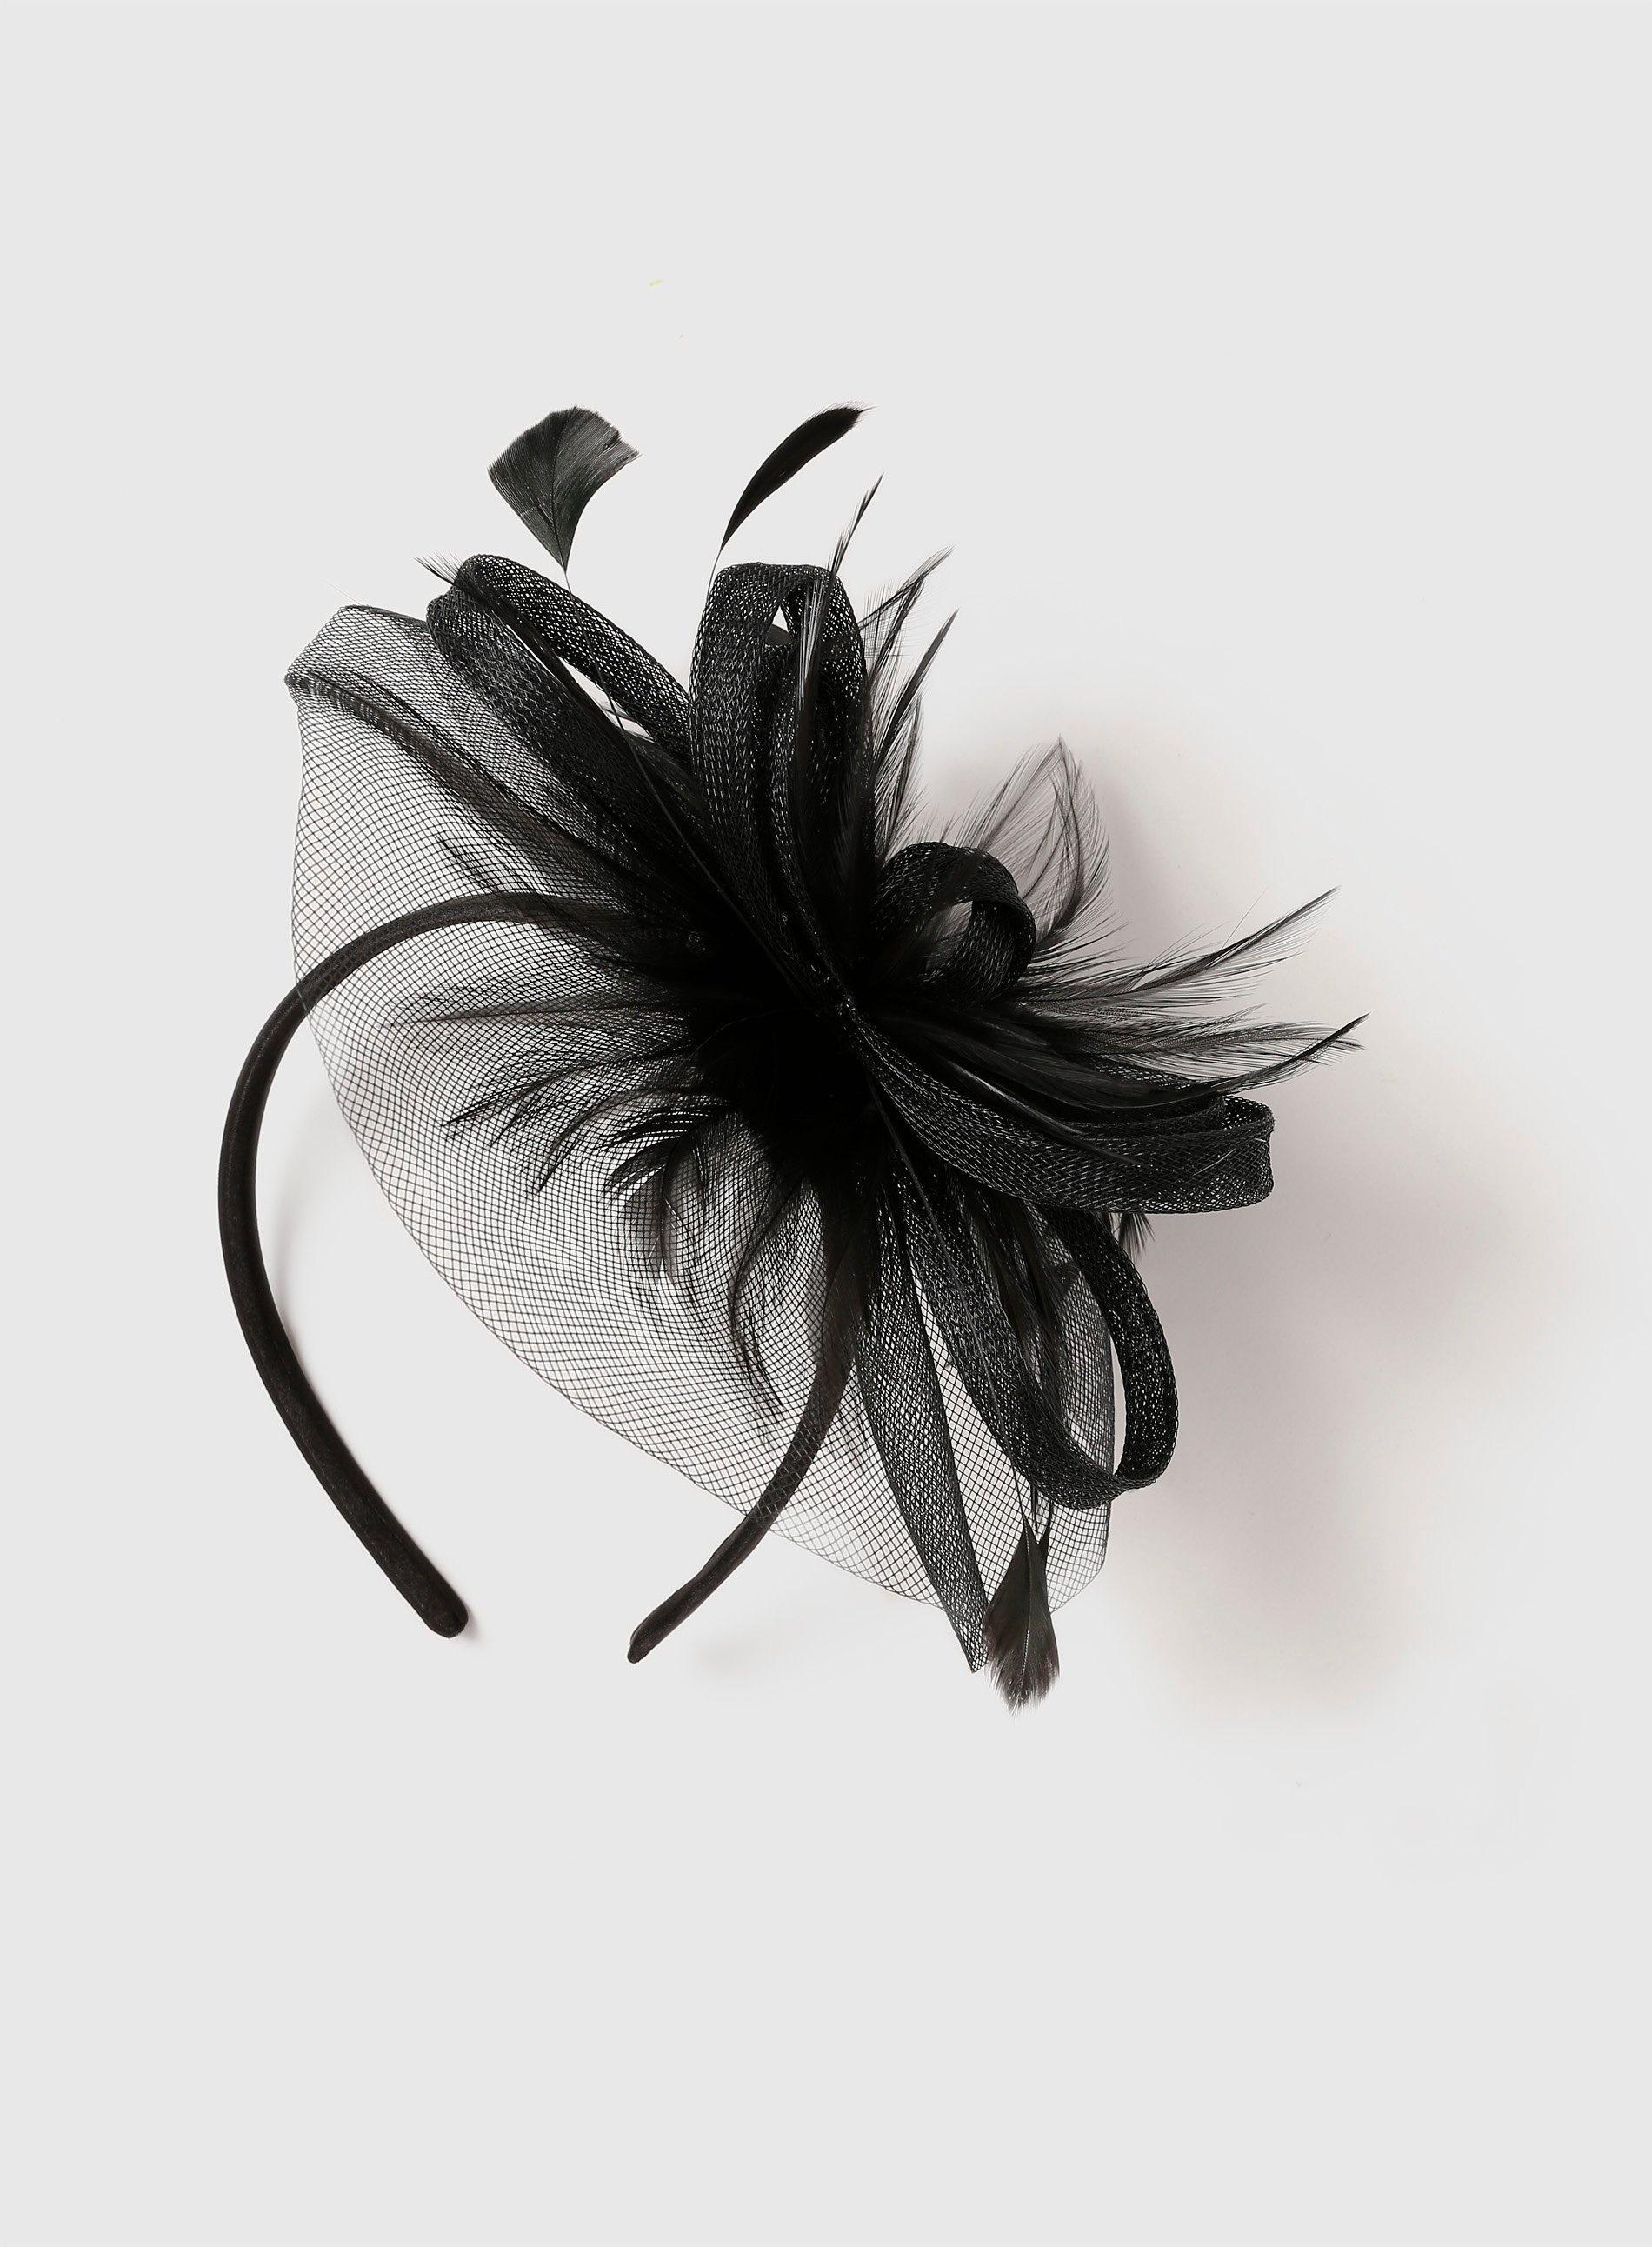 b483306ea2c4f Dorothy Perkins Black Feather Mesh Fascinator in Black - Lyst